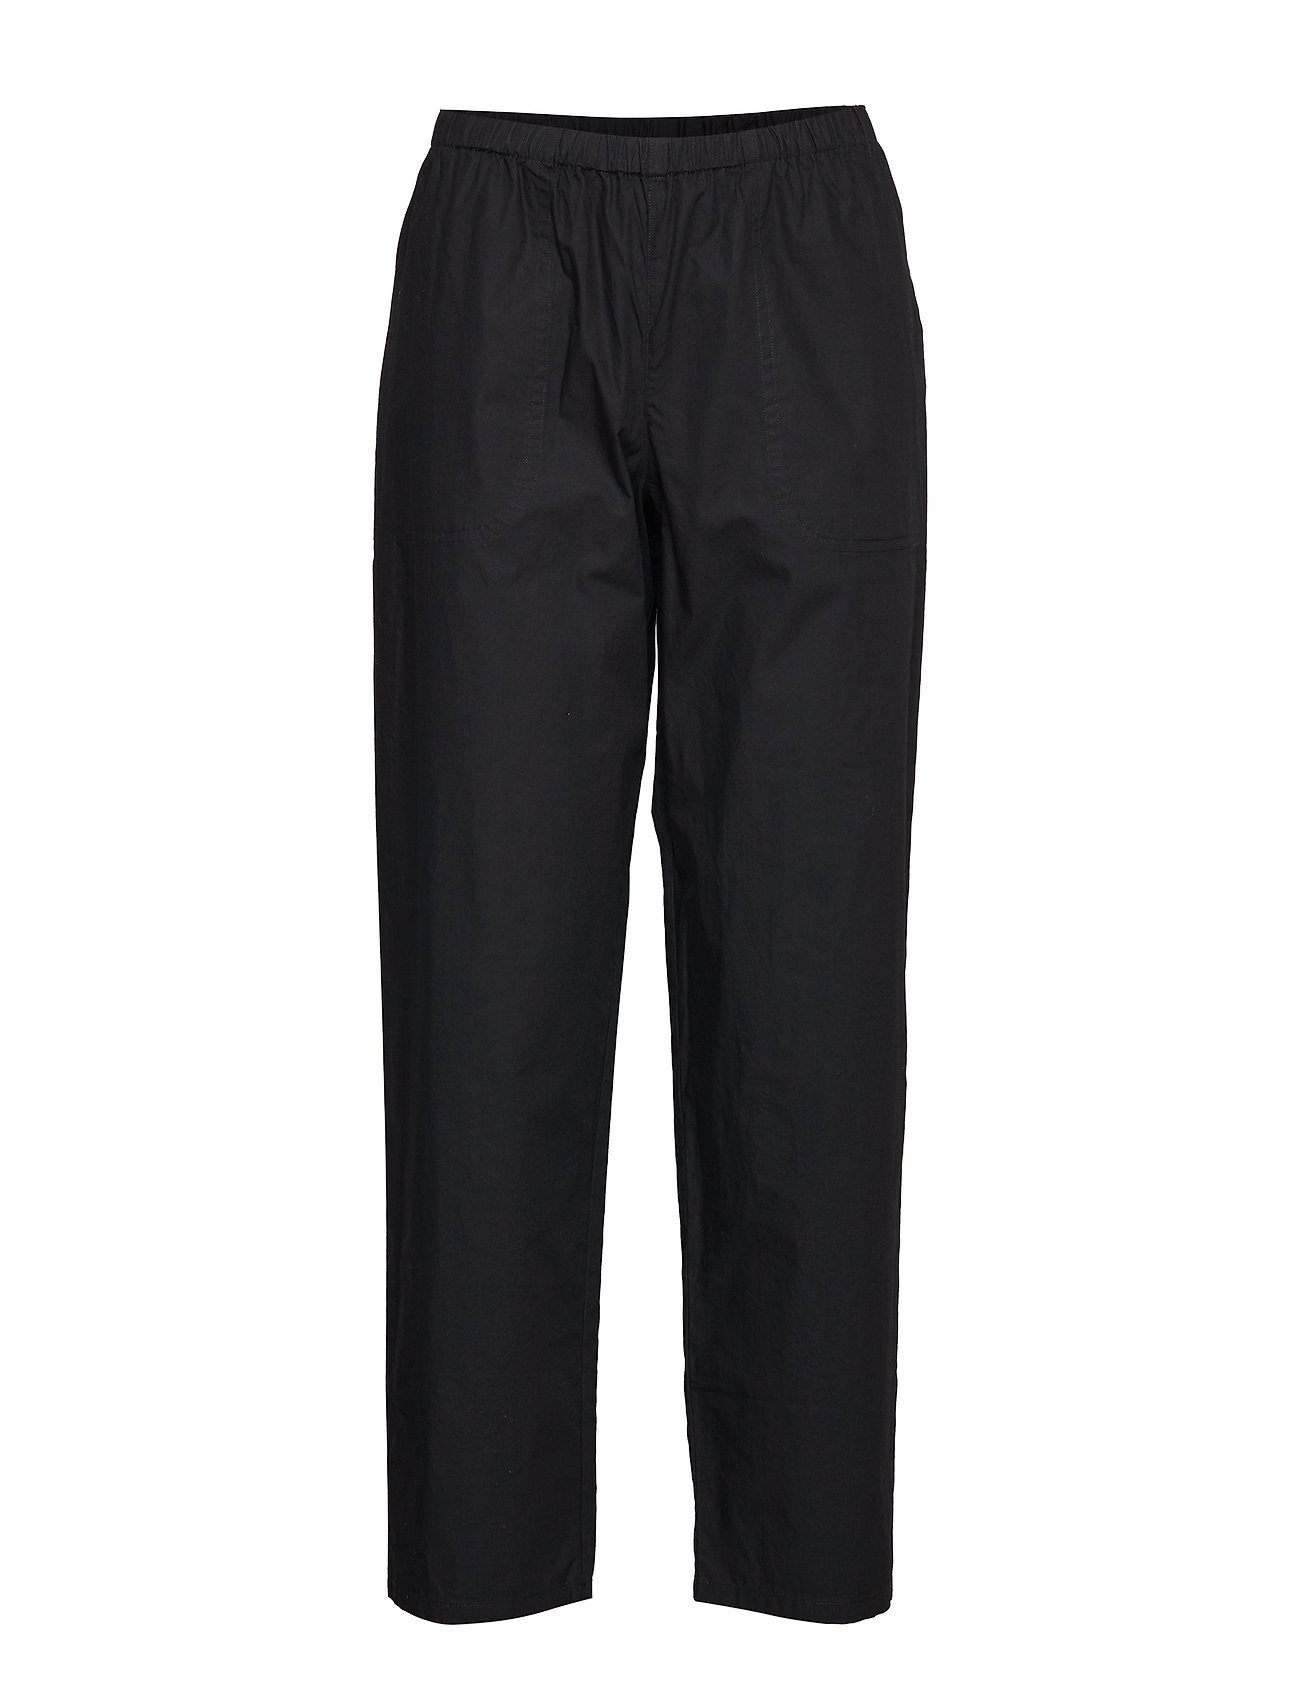 Samsøe Samsøe Morinda trousers 10879 - BLACK